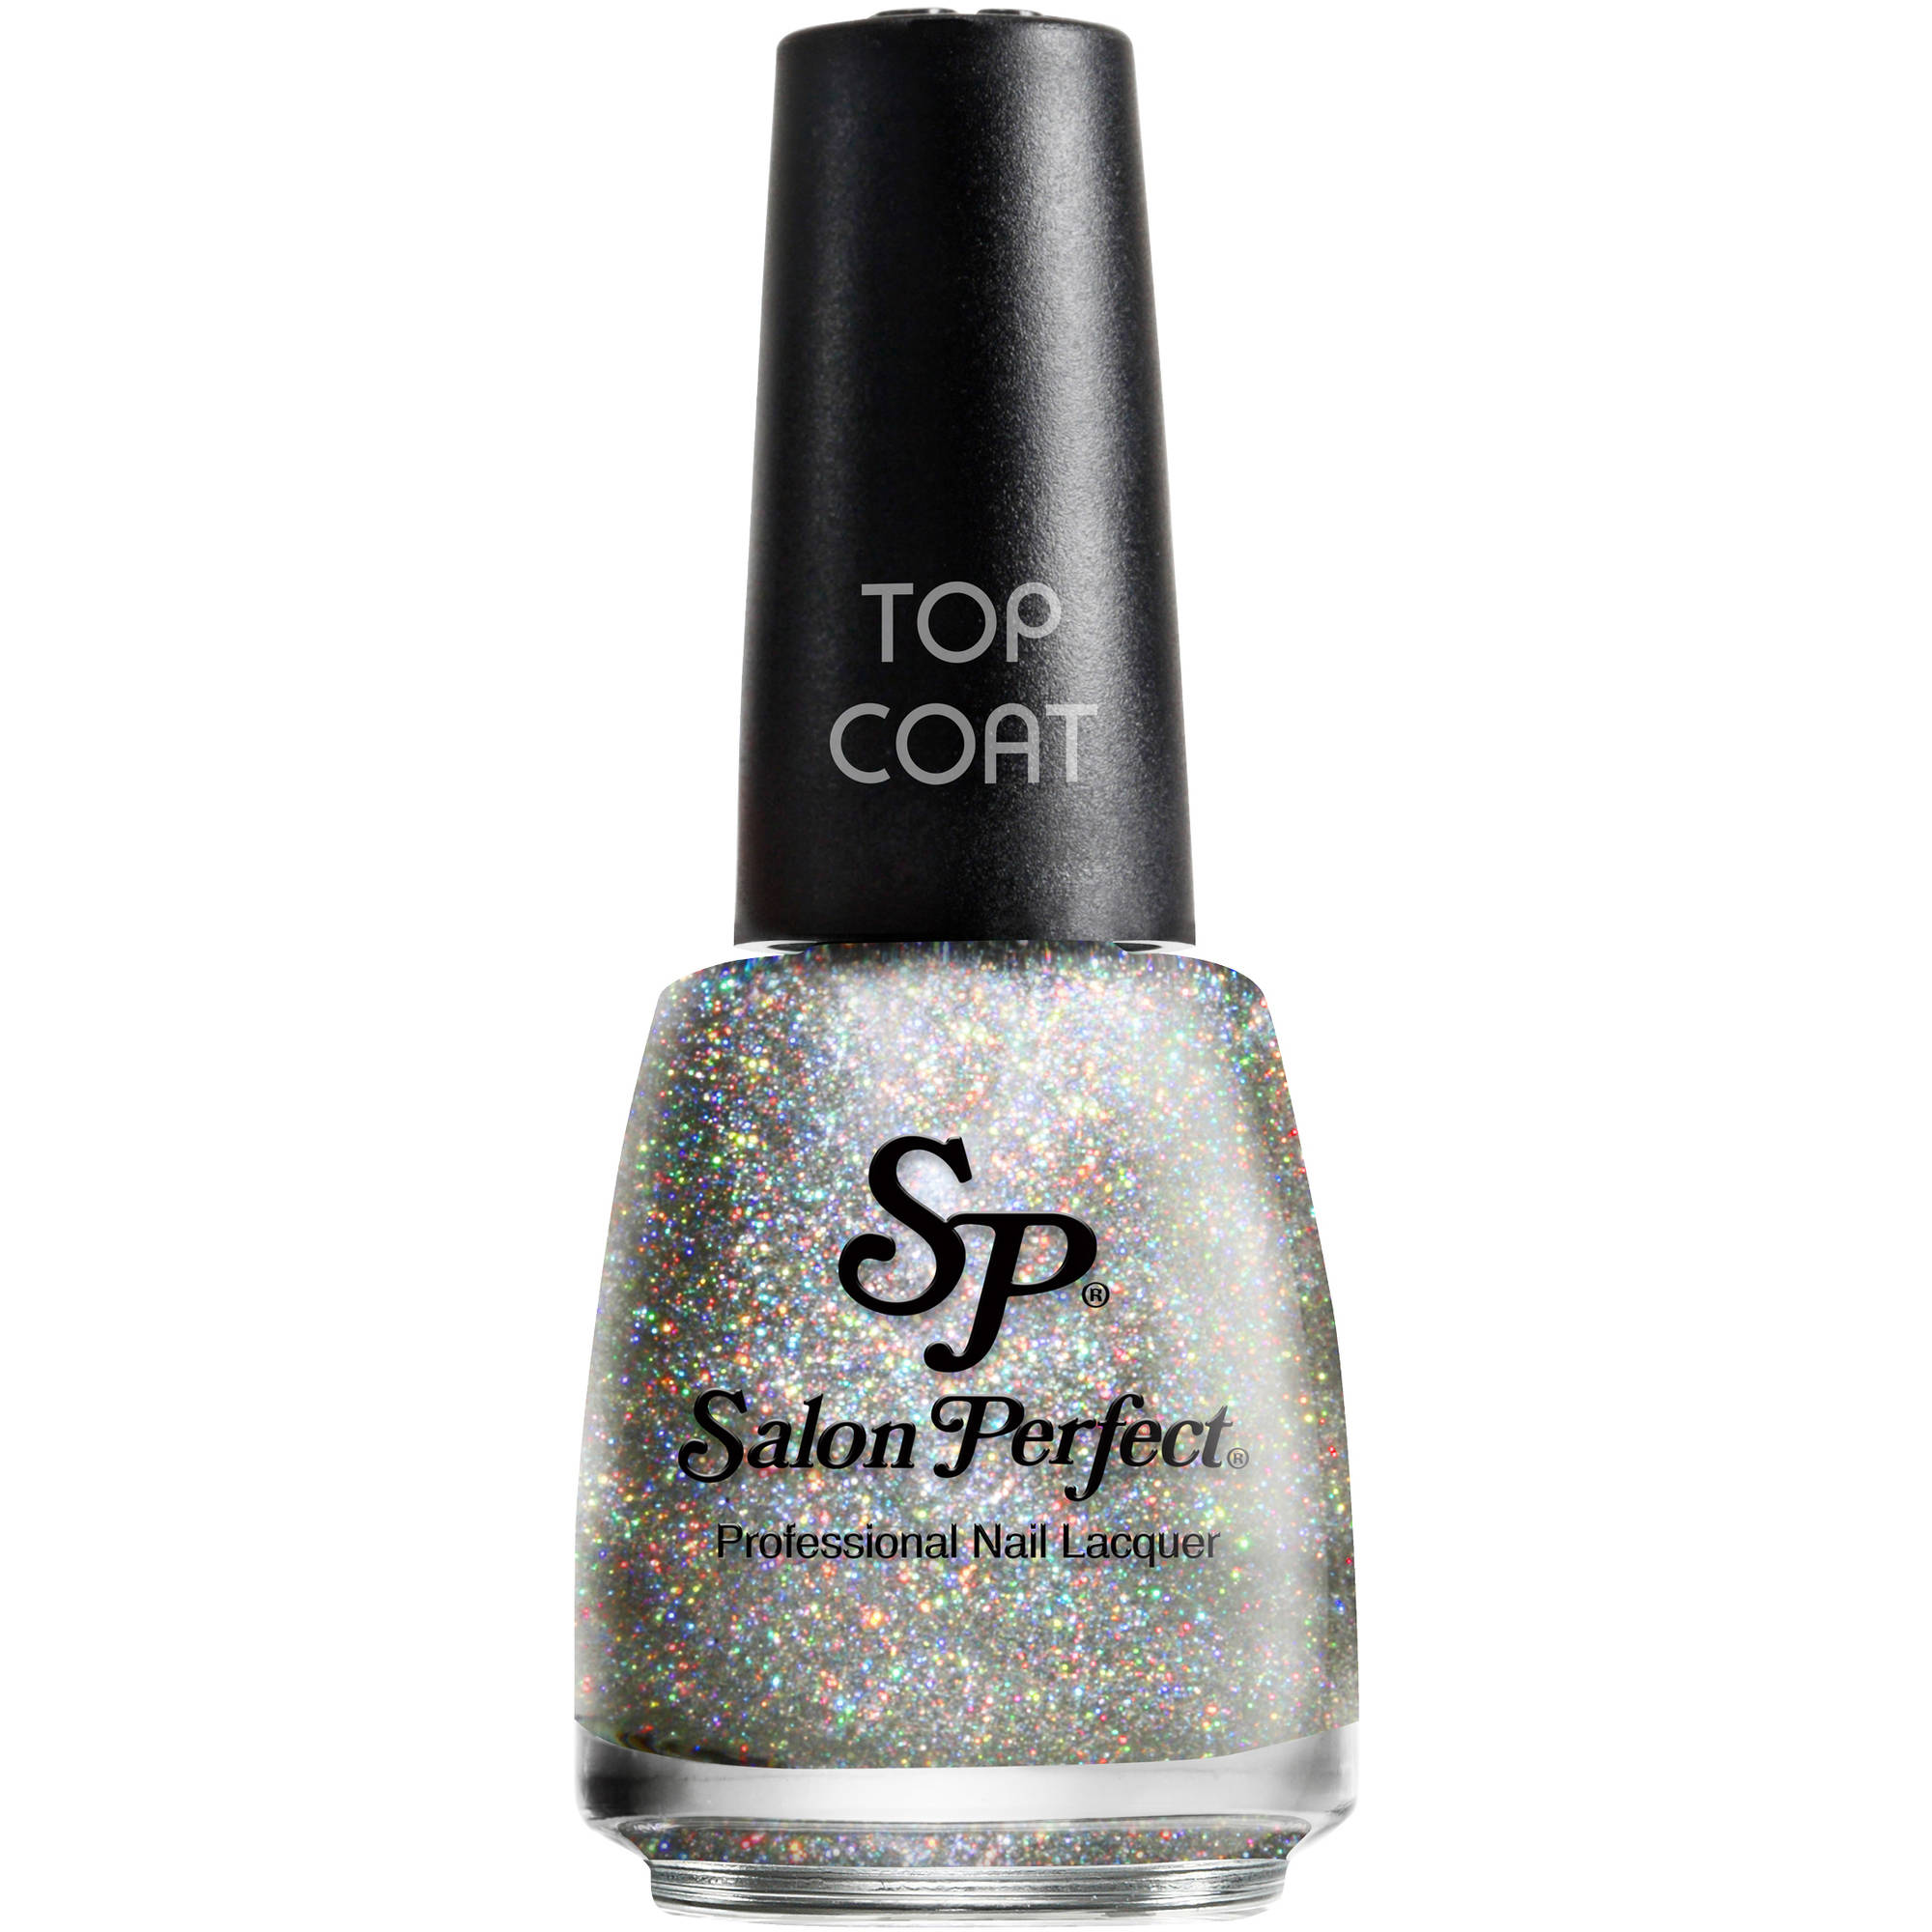 Salon Perfect Professional Nail Lacquer, 613 Cosmic Dust, 0.5 fl oz